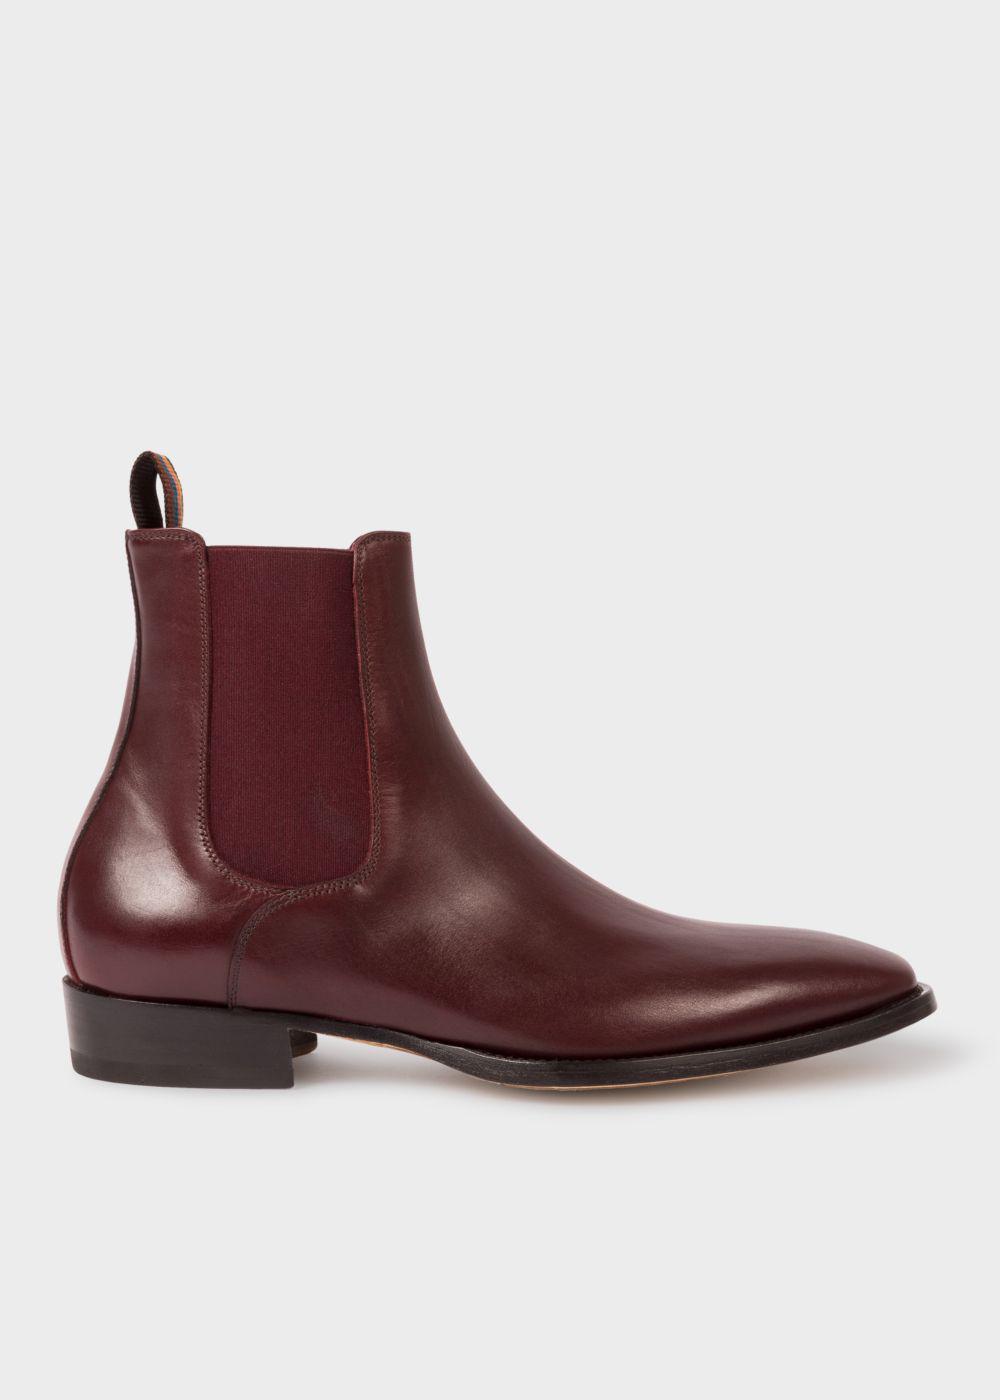 fe1976ca0f6 Lyst - Paul Smith Men s Bordeaux Leather  bobby  Chelsea Boots for Men